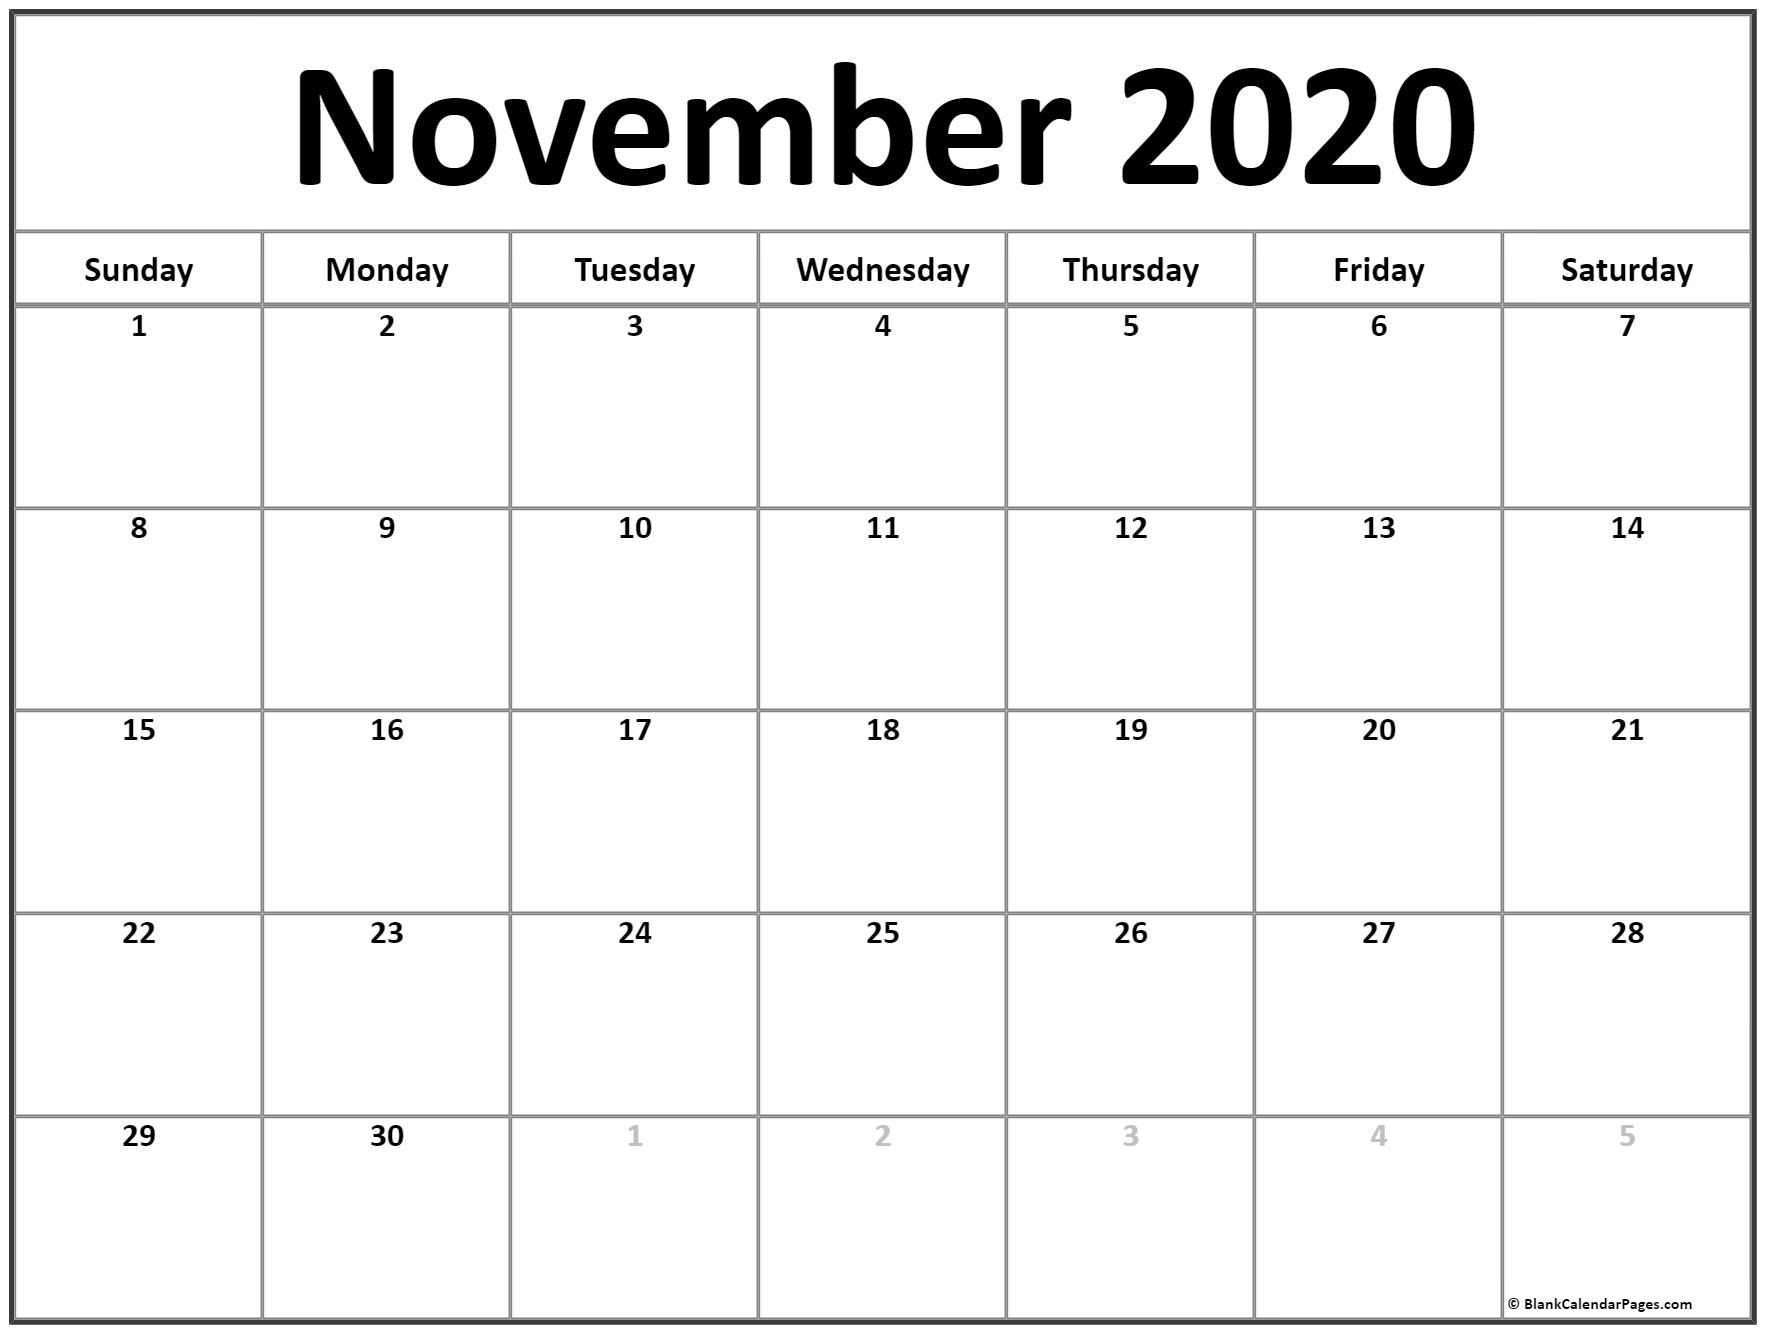 Zodiac Calendar November 2020 | Month Calendar Printable